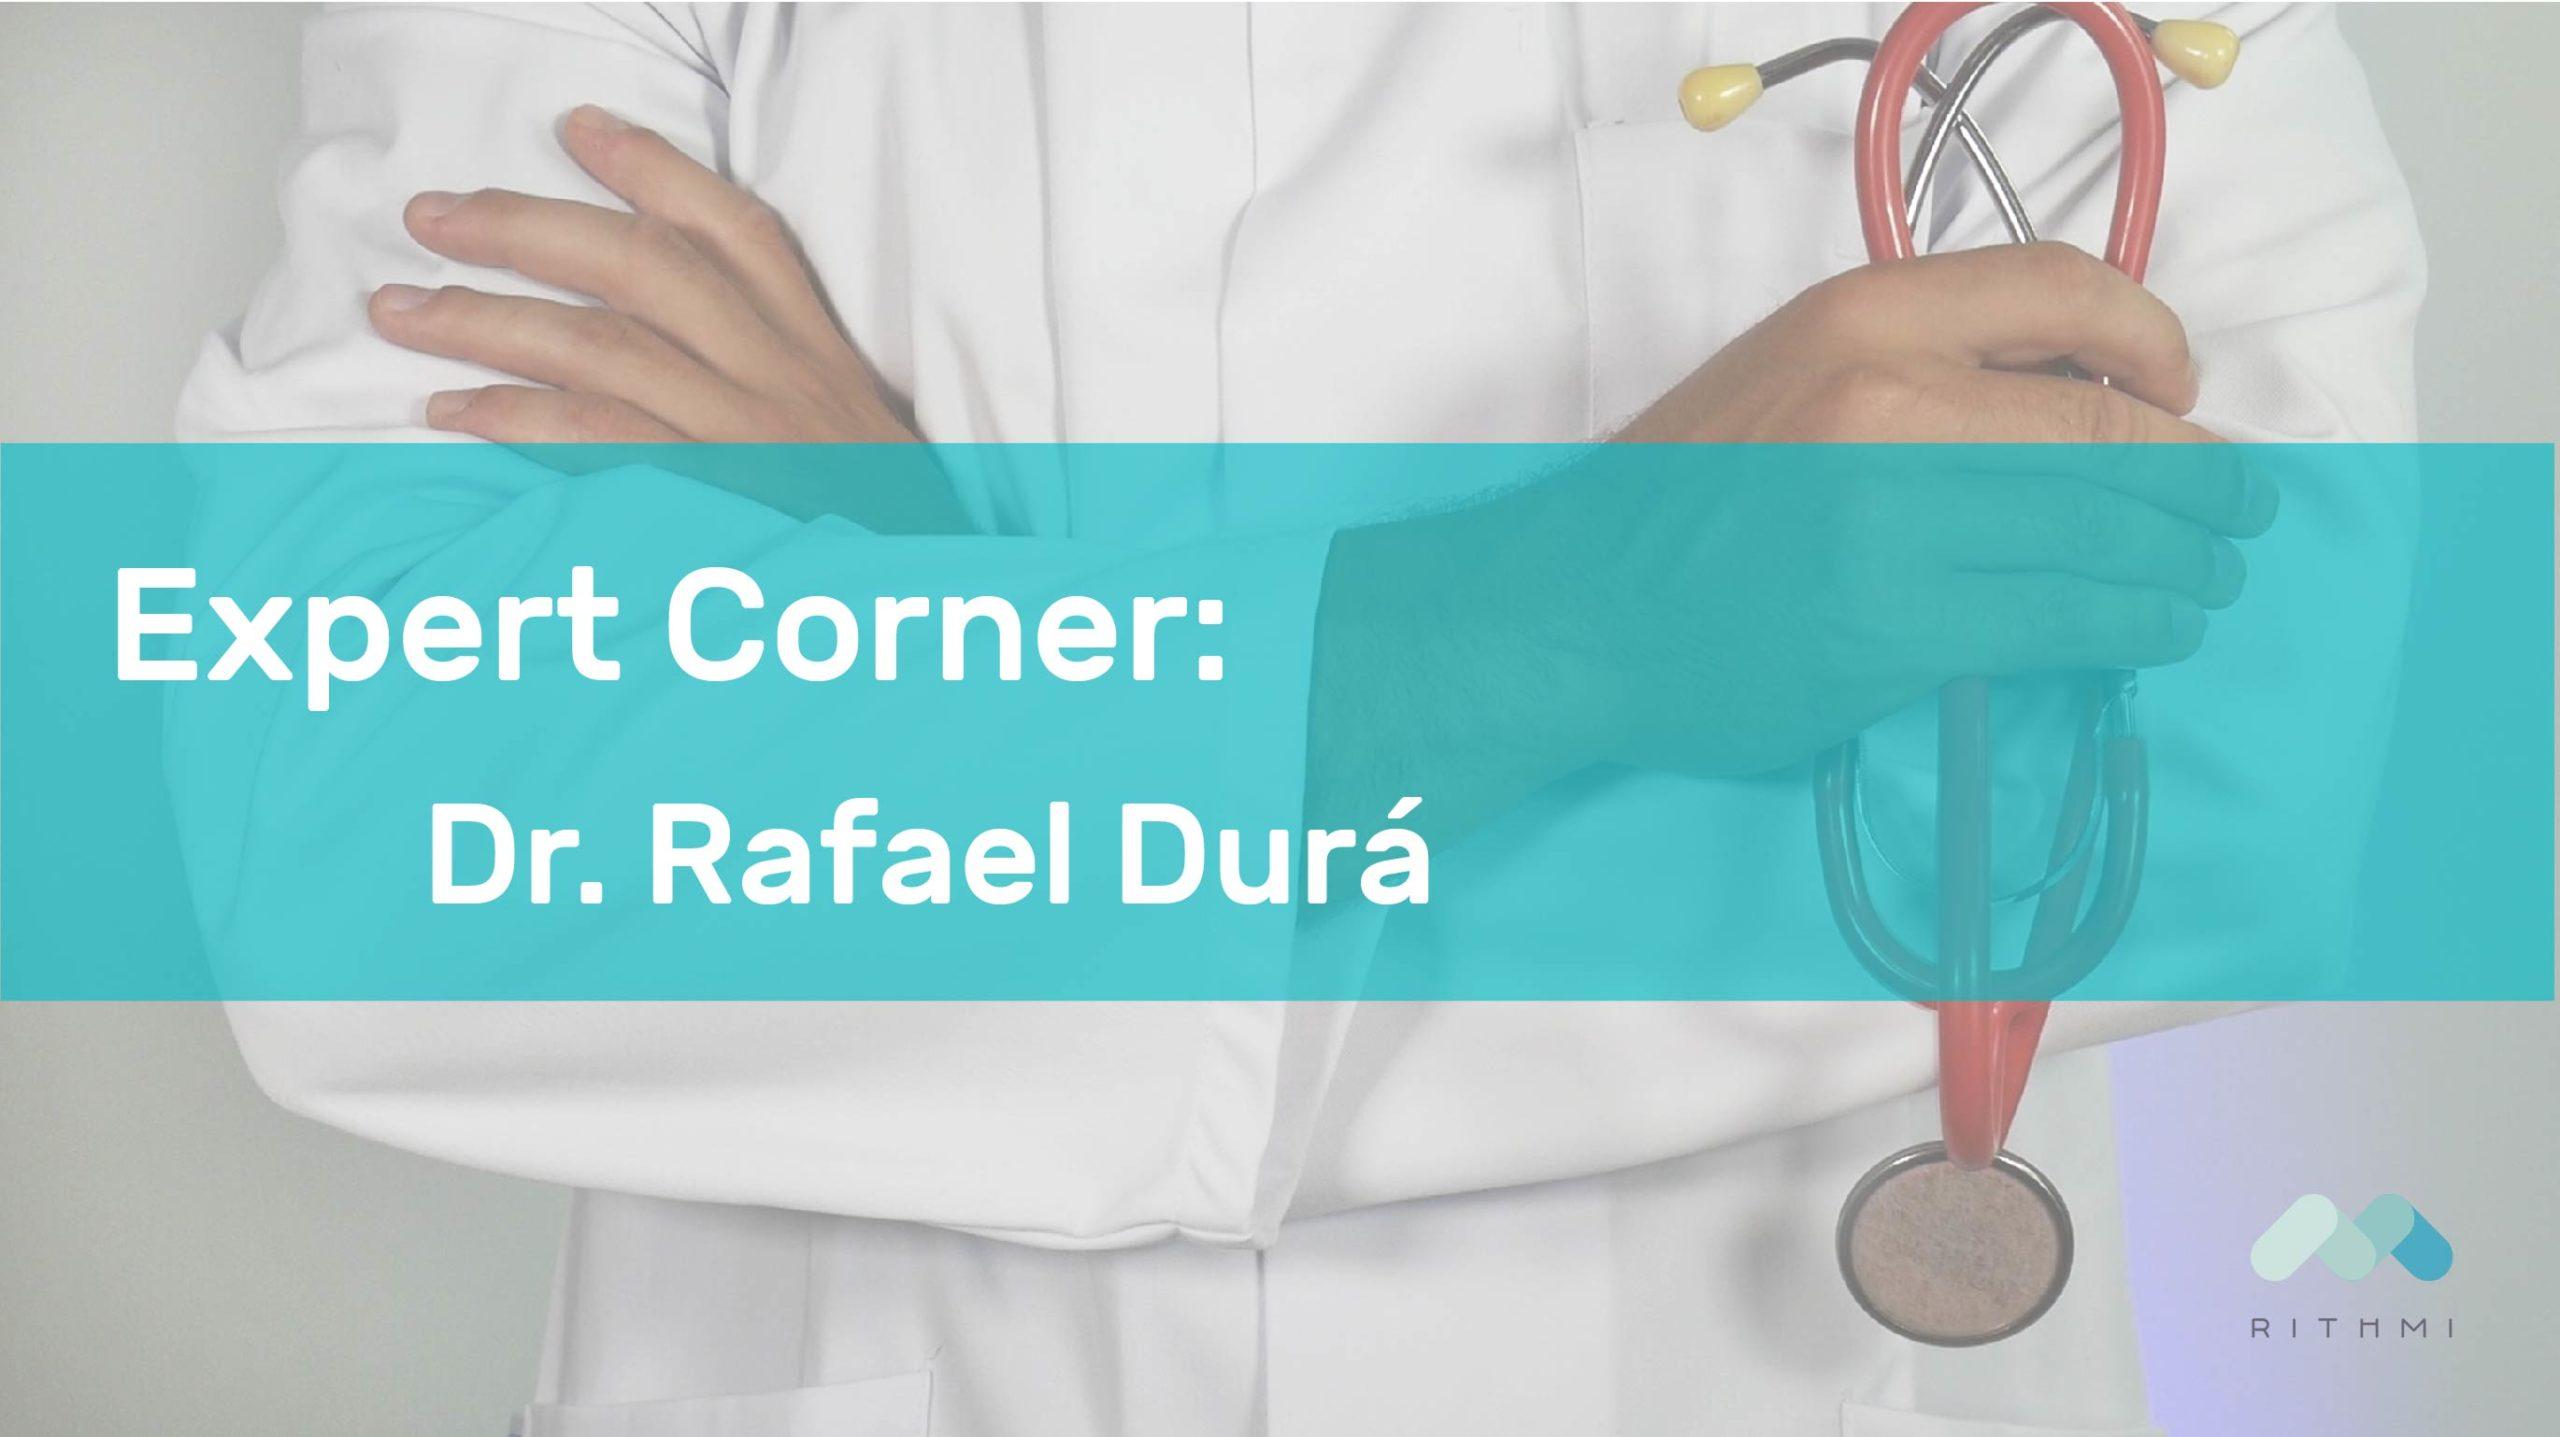 Expert Corner, Dr. Rafael Durá Belinchón